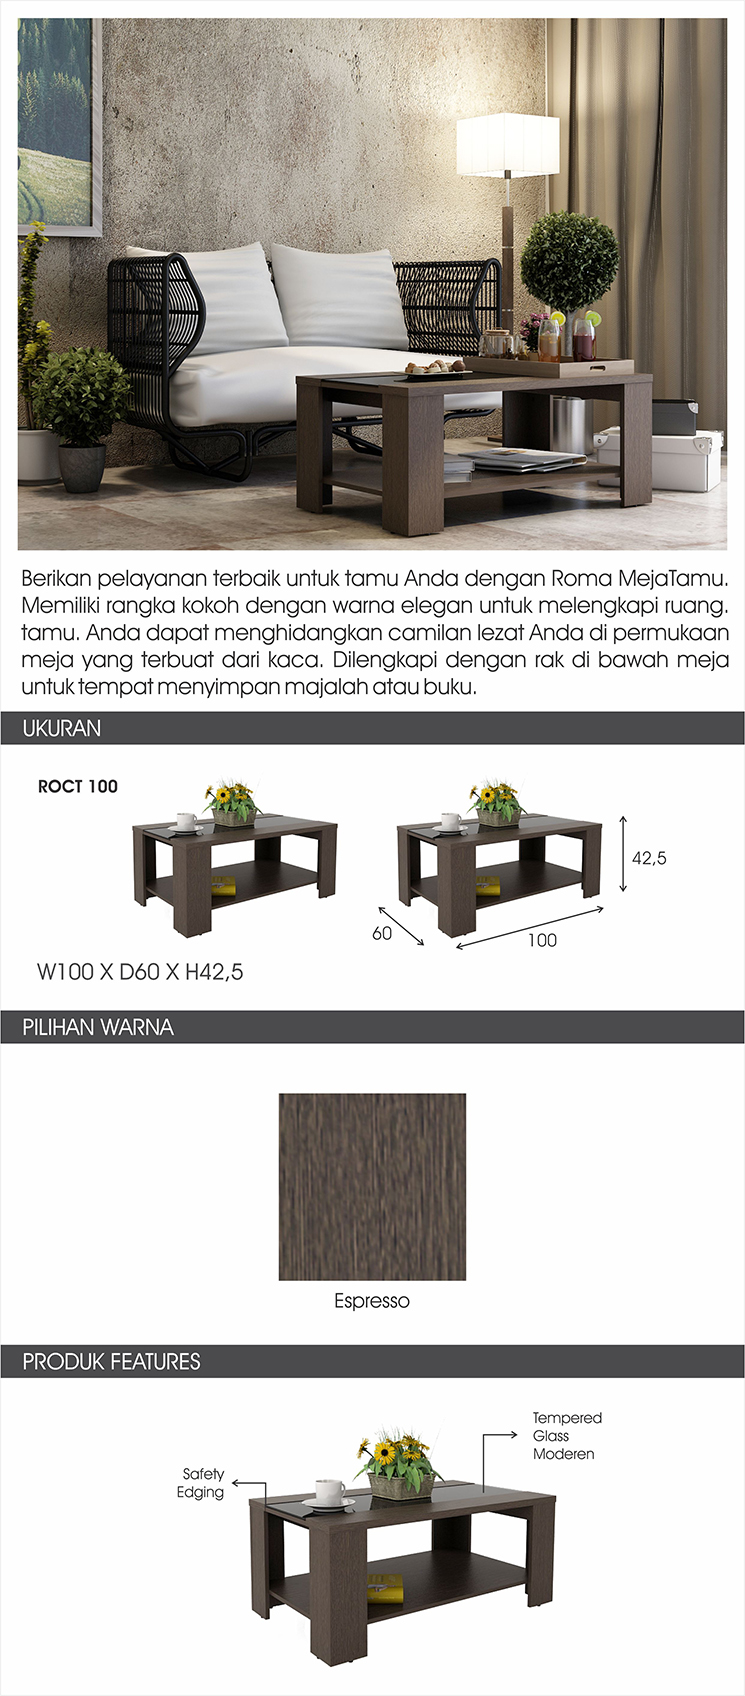 Pro Design Tiara Meja Tamu Espresso Khusus Jawa Bali Daftar Harga Brico 120 Sanremo Light Black Roma